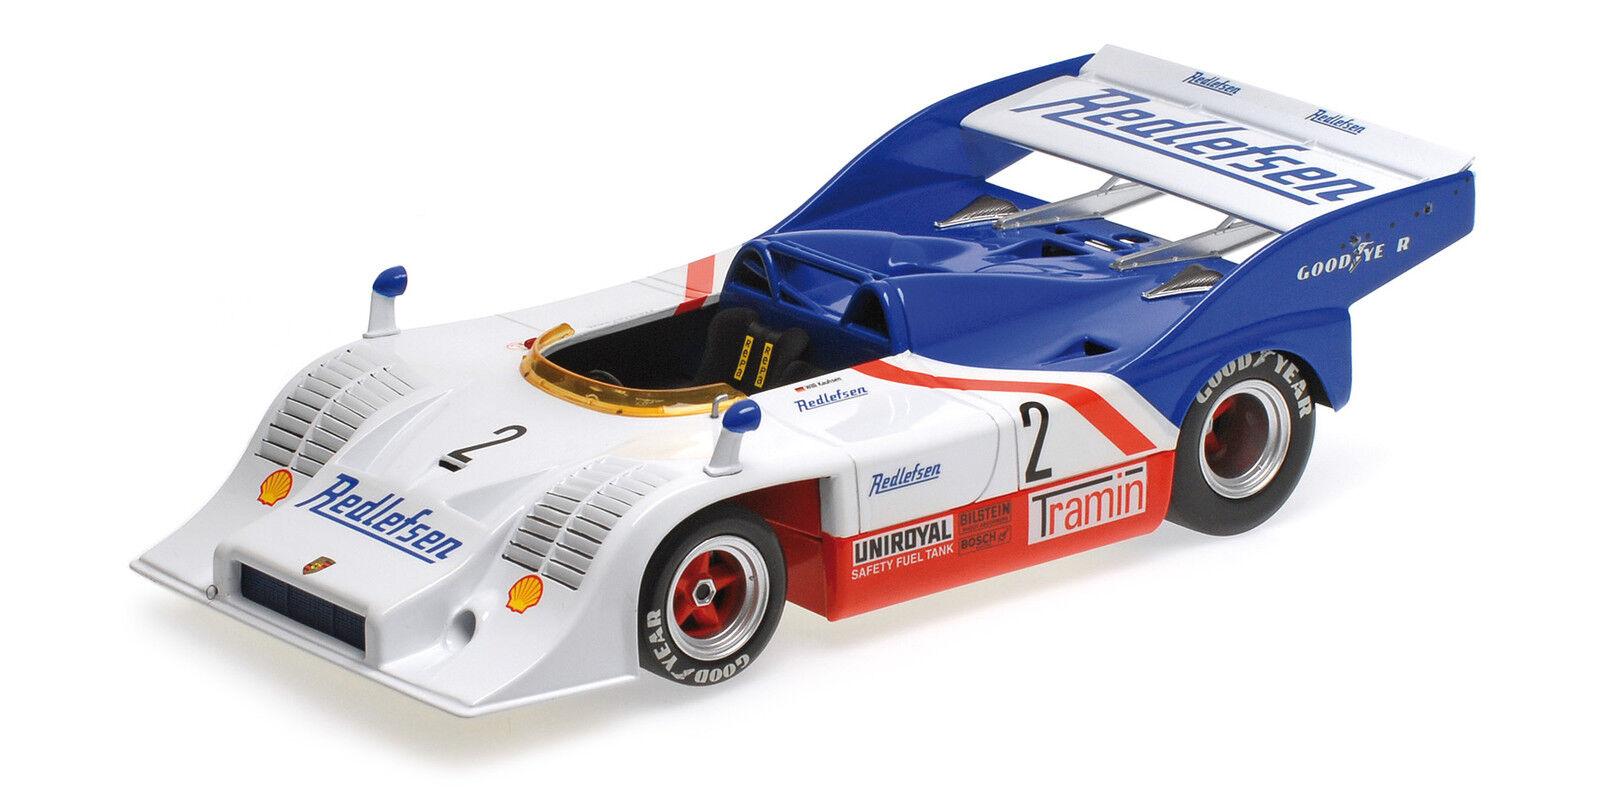 Porsche 917 10 Willi Kauhsen Nurburgring Interserie 1974 1 18 Model MINICHAMPS